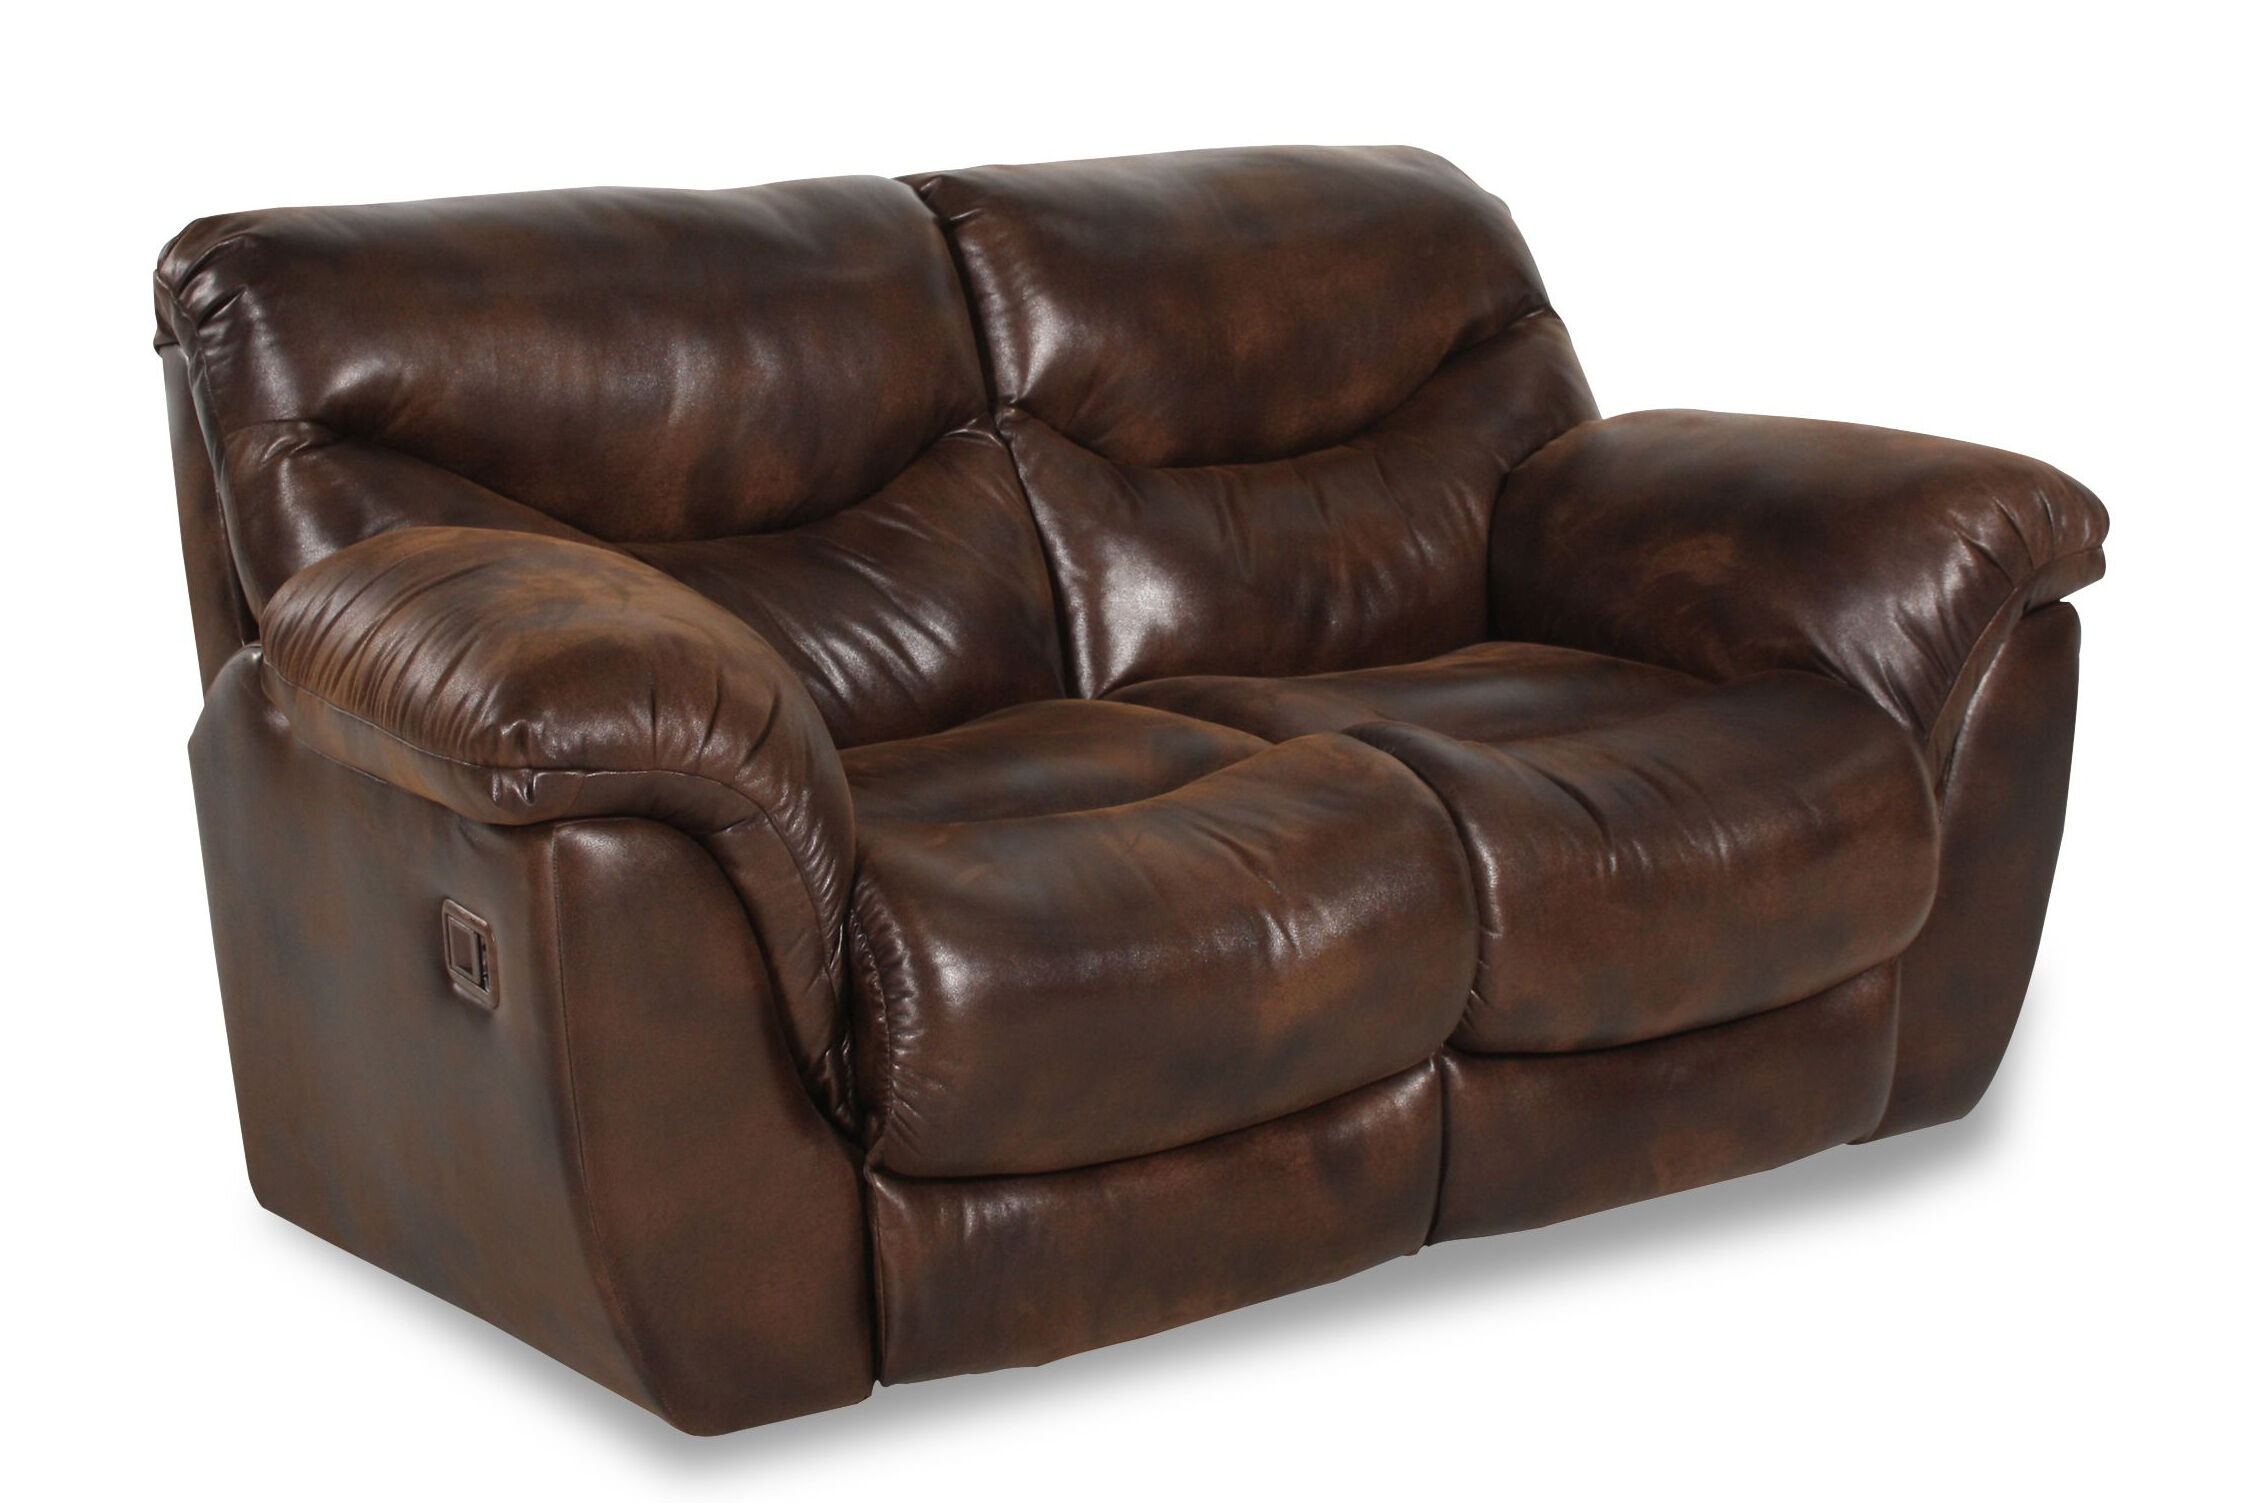 lane triple reclining sofa white formal dreamer espresso loveseat mathis brothers